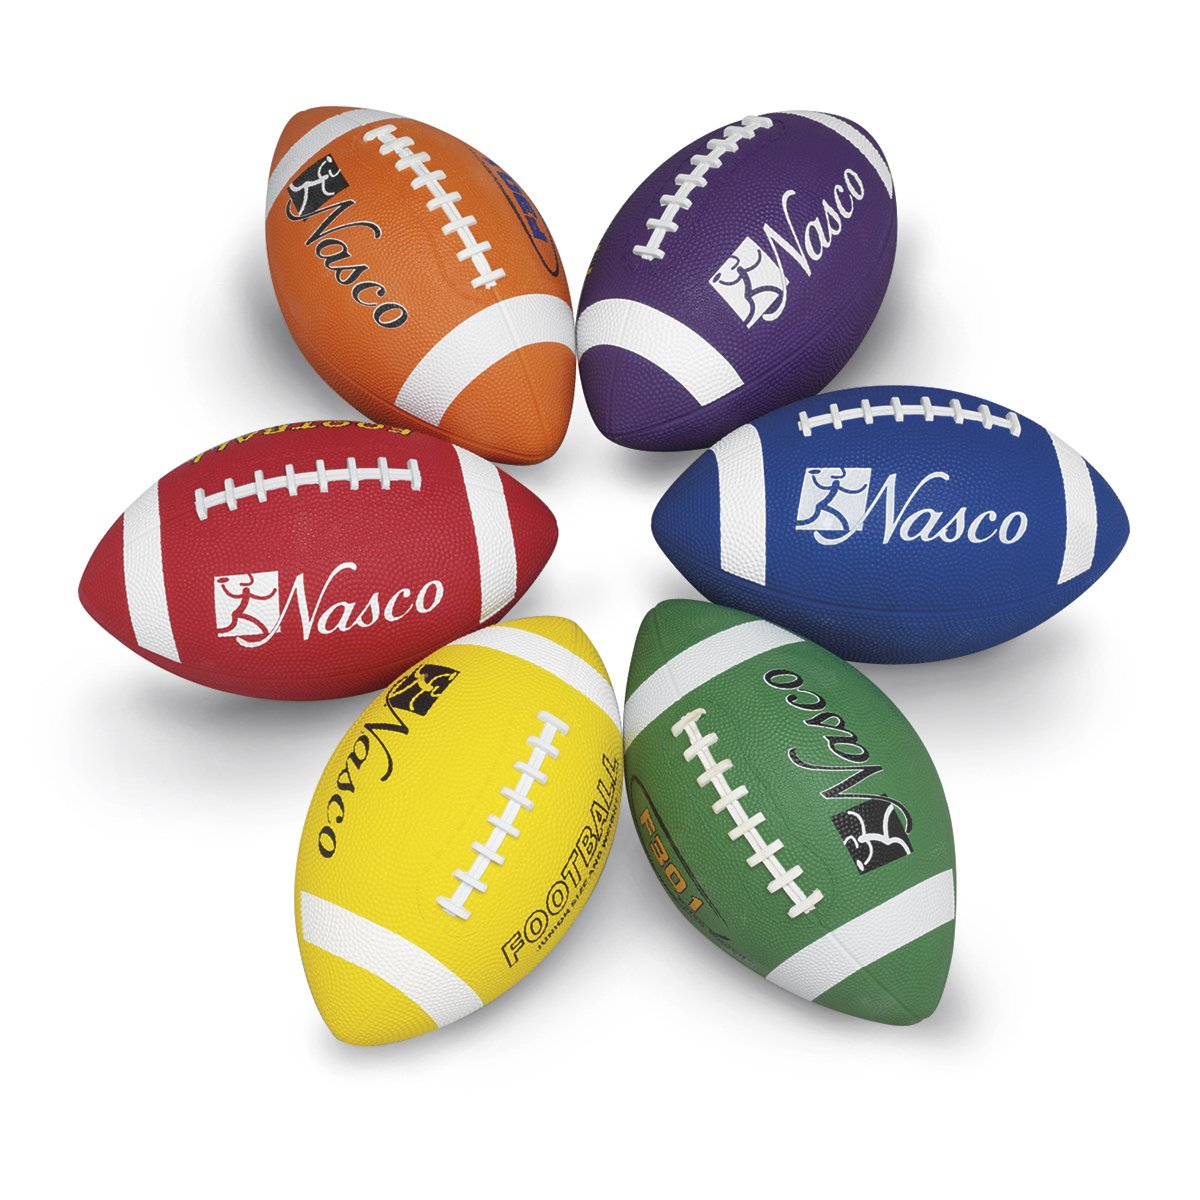 MAC-T Junior Size 3 Footballs - 6 - Colour Set B01NCJ0RNI